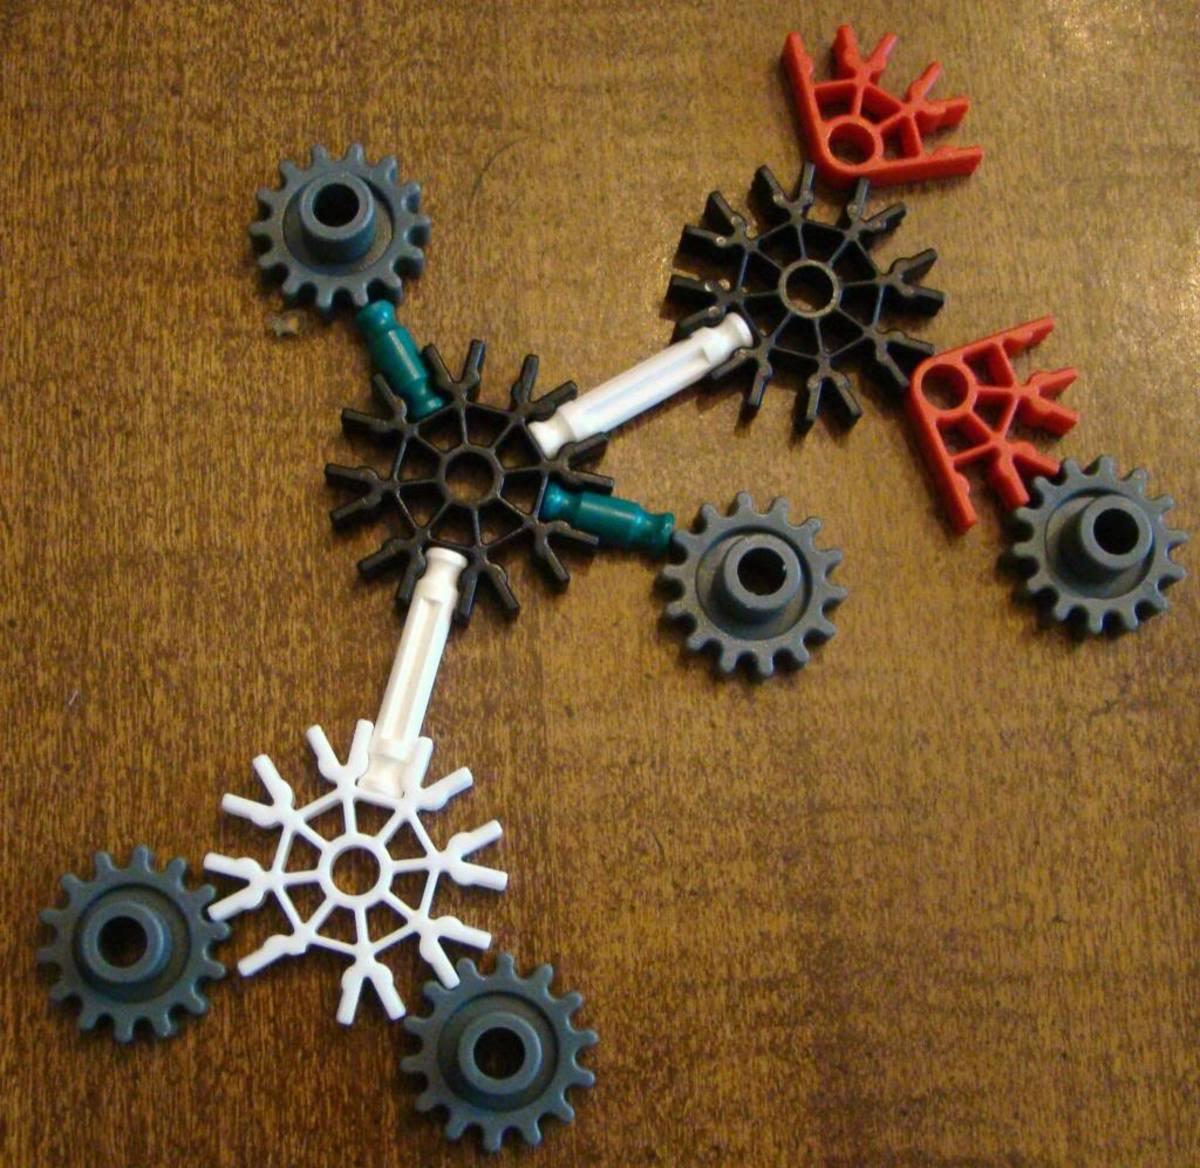 We made molecules with K'nex.